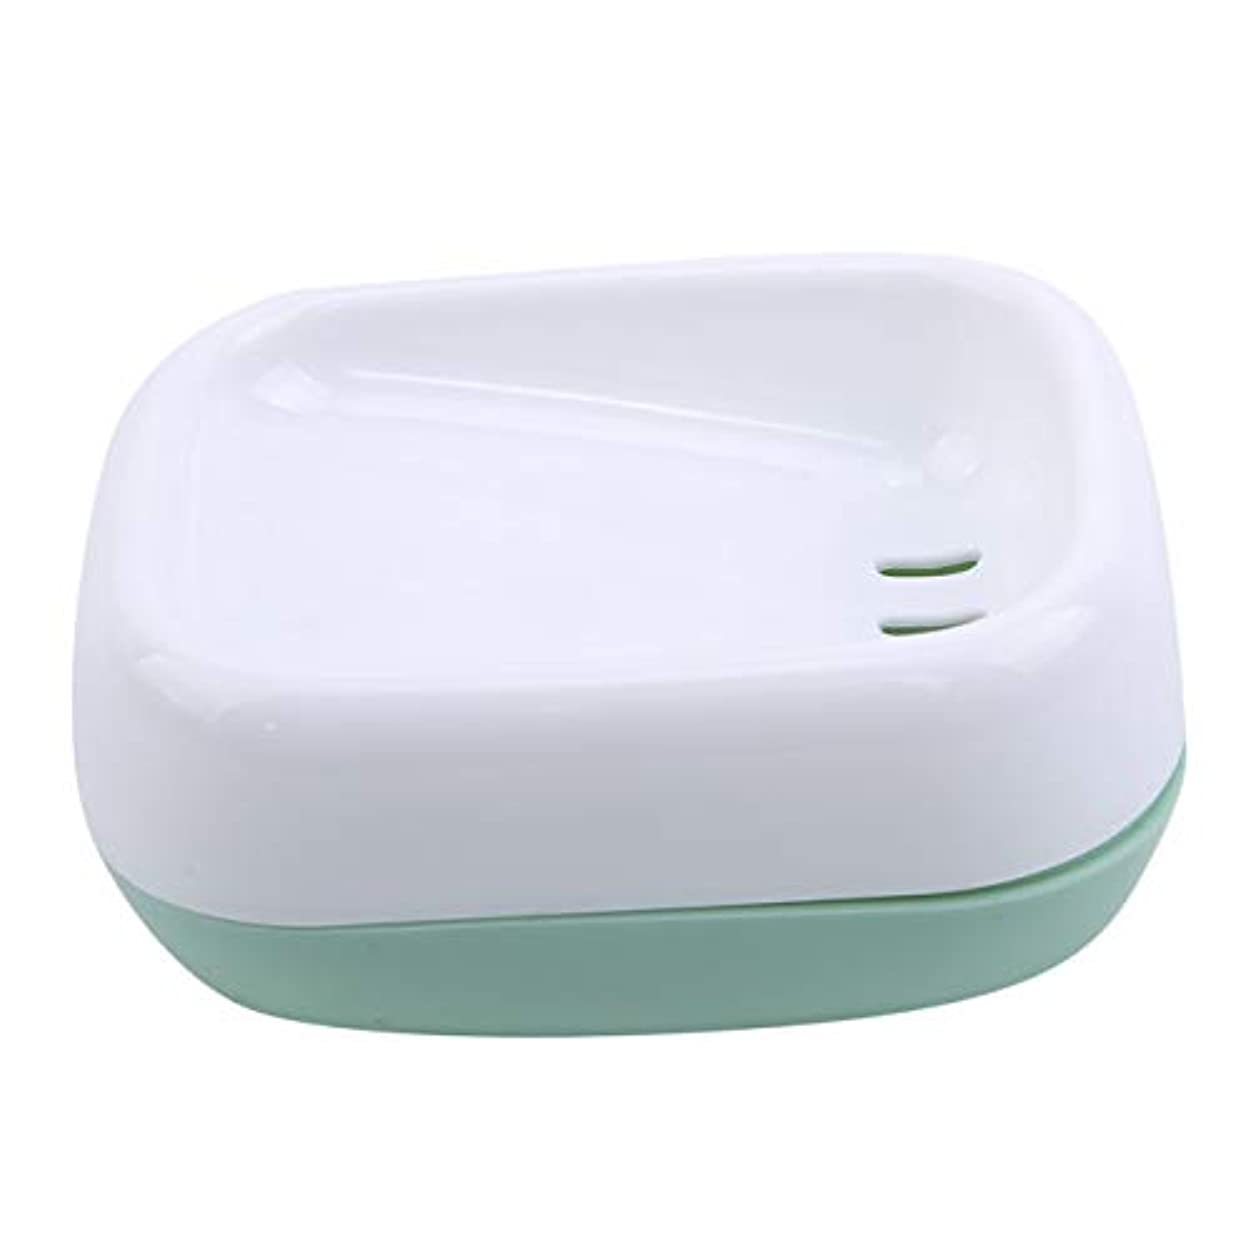 ZALINGソープディッシュボックス浴室プラスチック二重層衛生的なシンプル排水コンテナソープディッシュグリーン